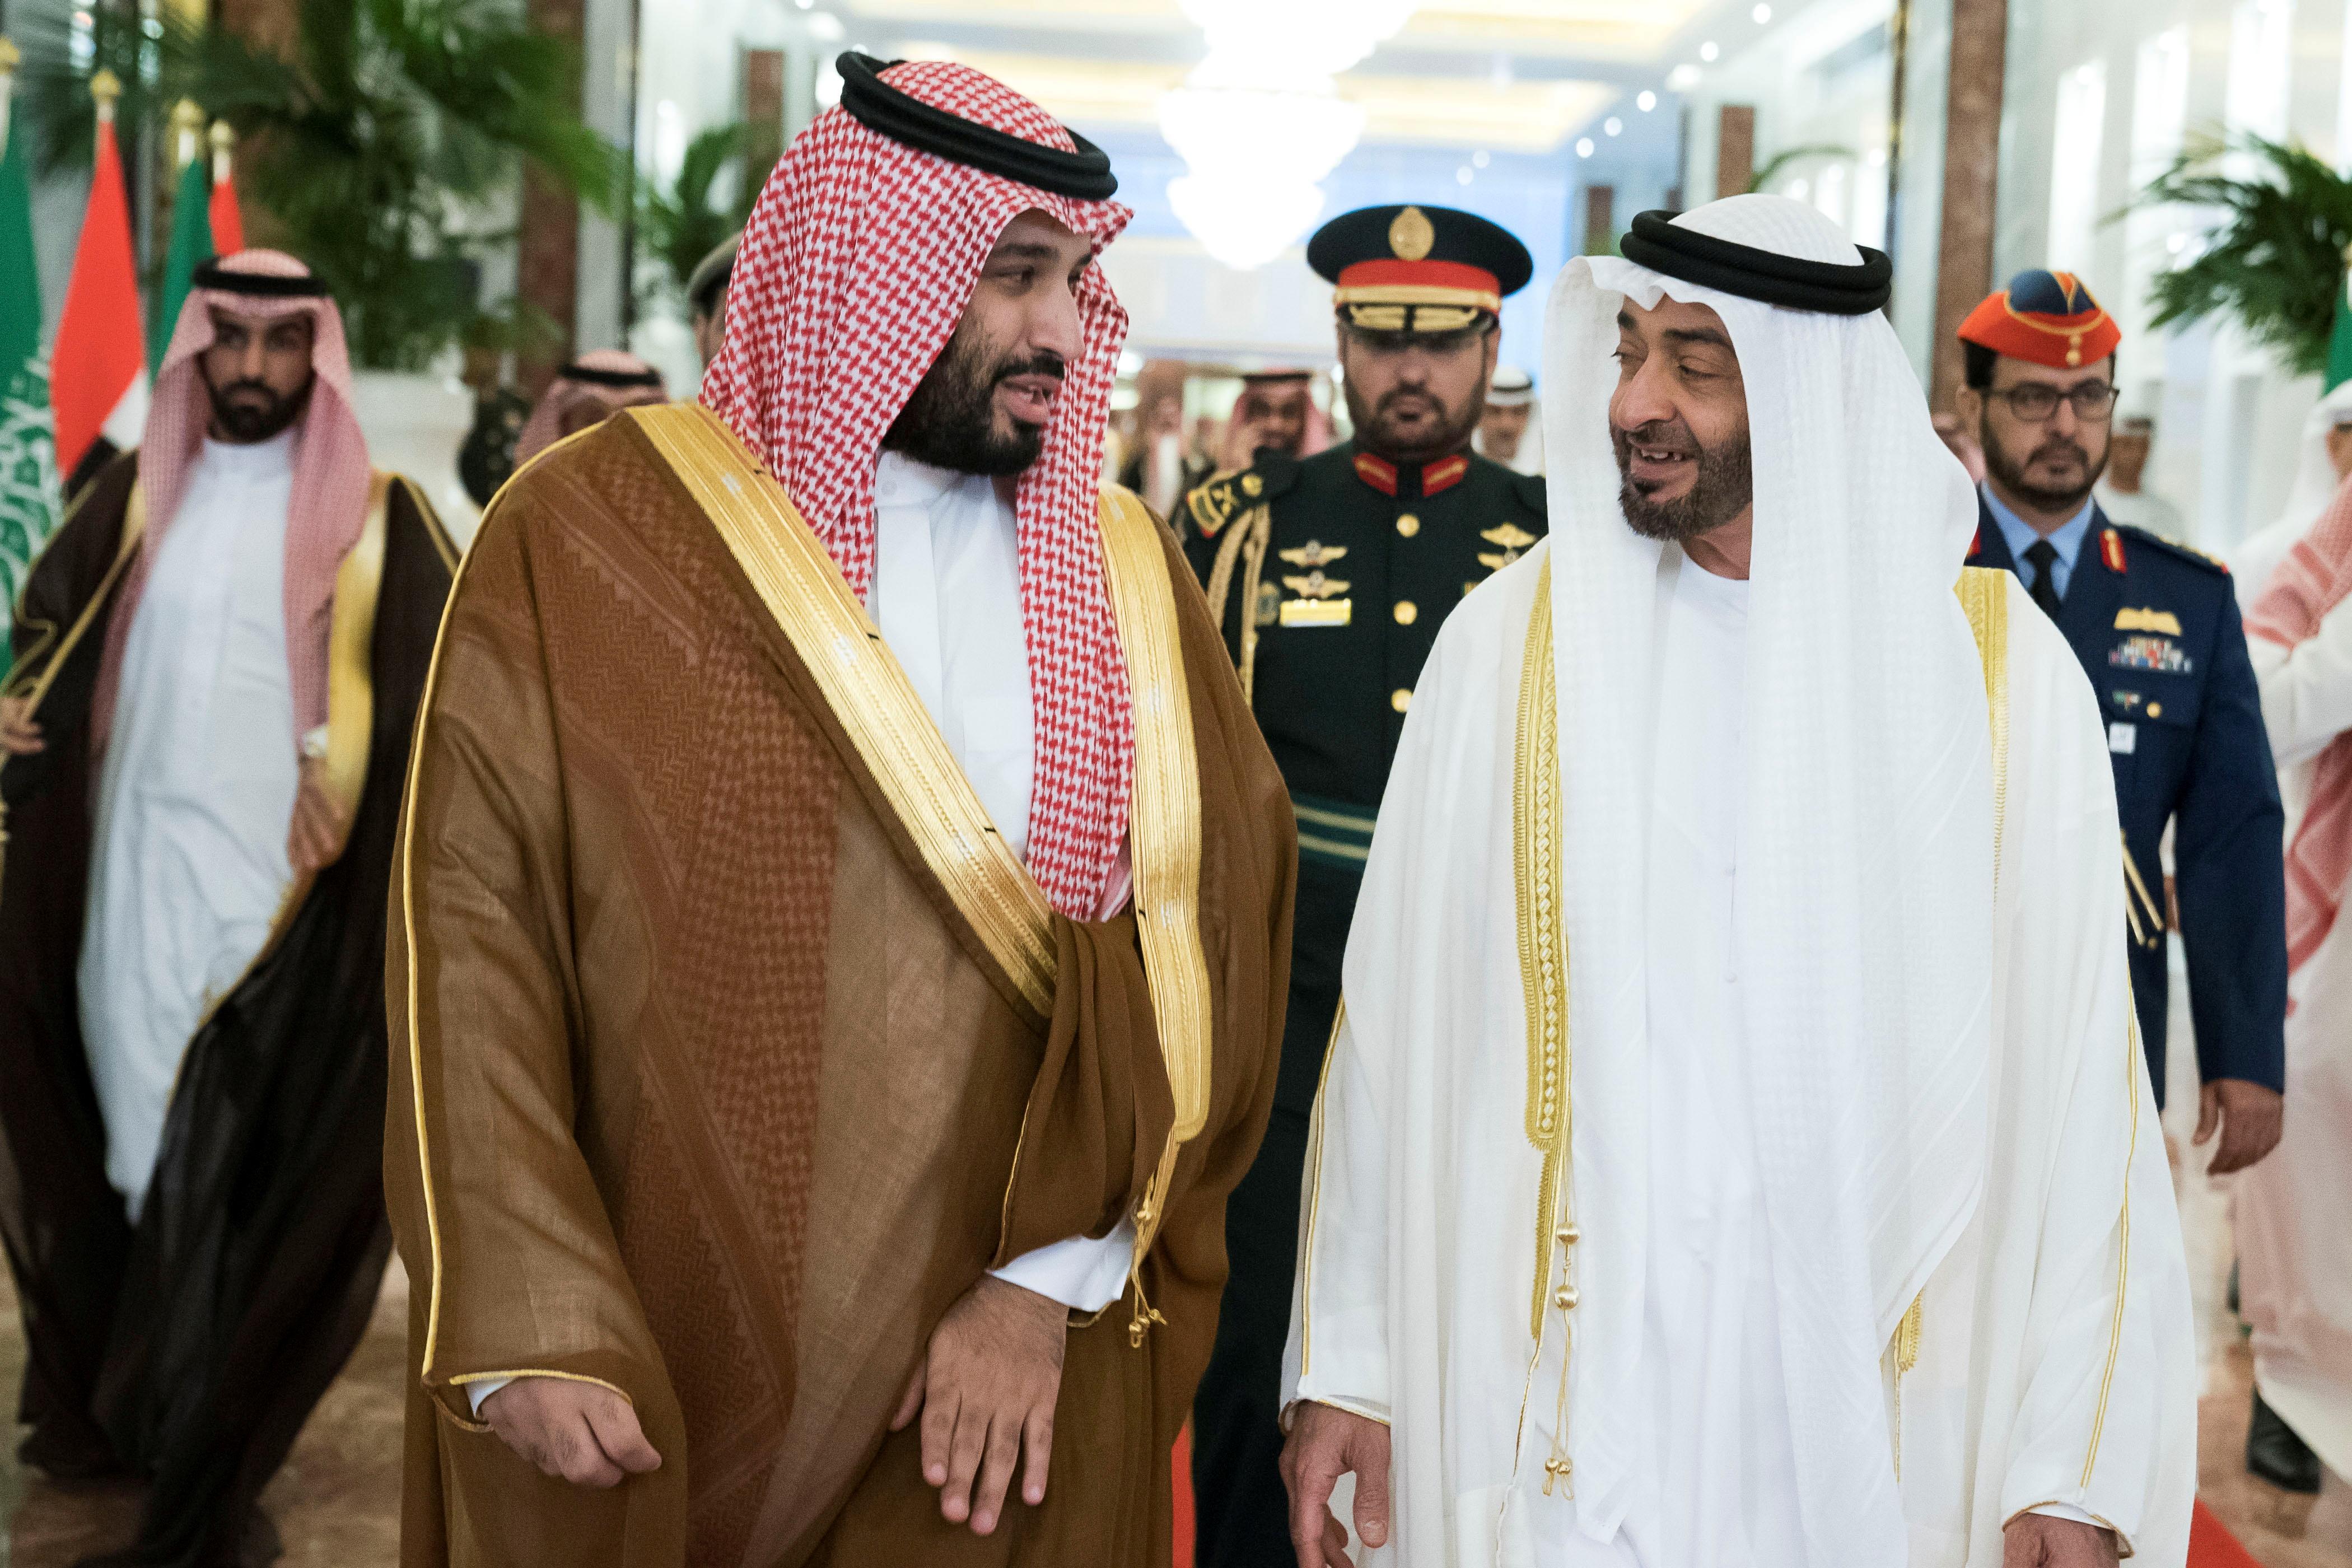 Abu Dhabi's Crown Prince Sheikh Mohammed bin Zayed al-Nahyan receives Saudi Crown Prince Mohammed bin Salman at the Presidential Airport in Abu Dhabi, United Arab Emirates November 27, 2019.  WAM/Handout via REUTERS